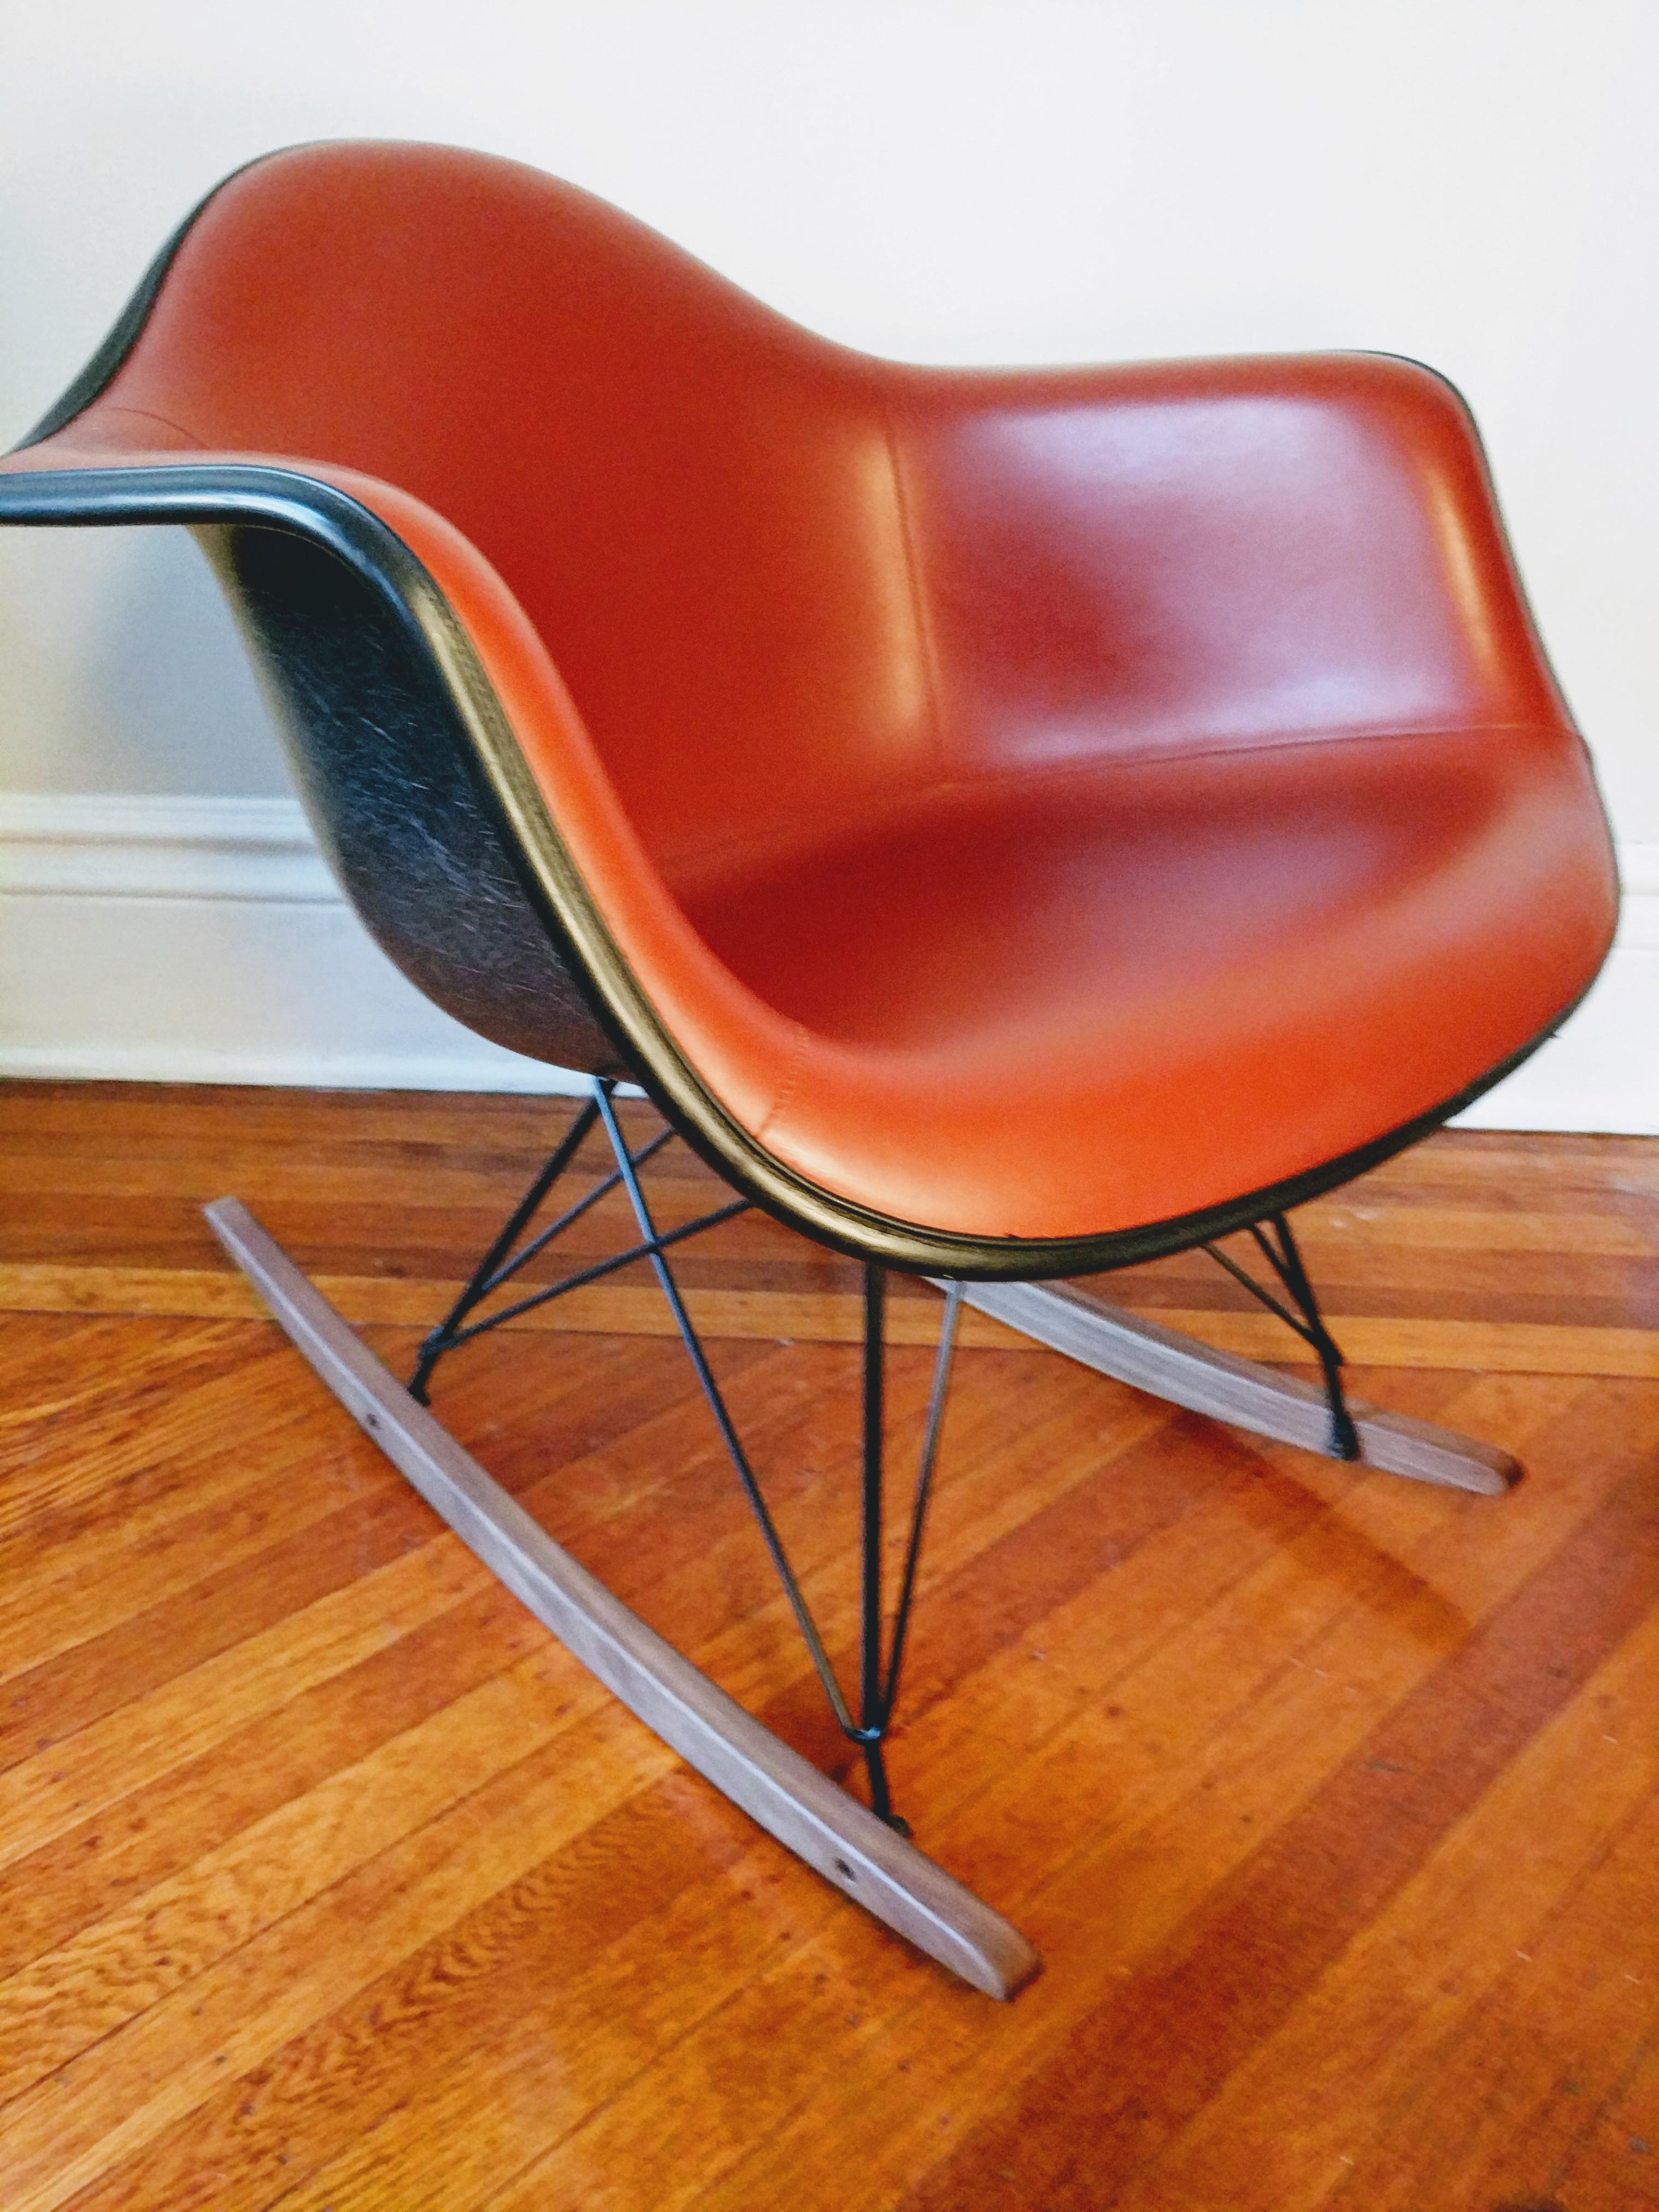 Eames For Herman Miller Armchair Rocker Rocking Chair Fiberglass Naugahyde    Image 8 Of 10